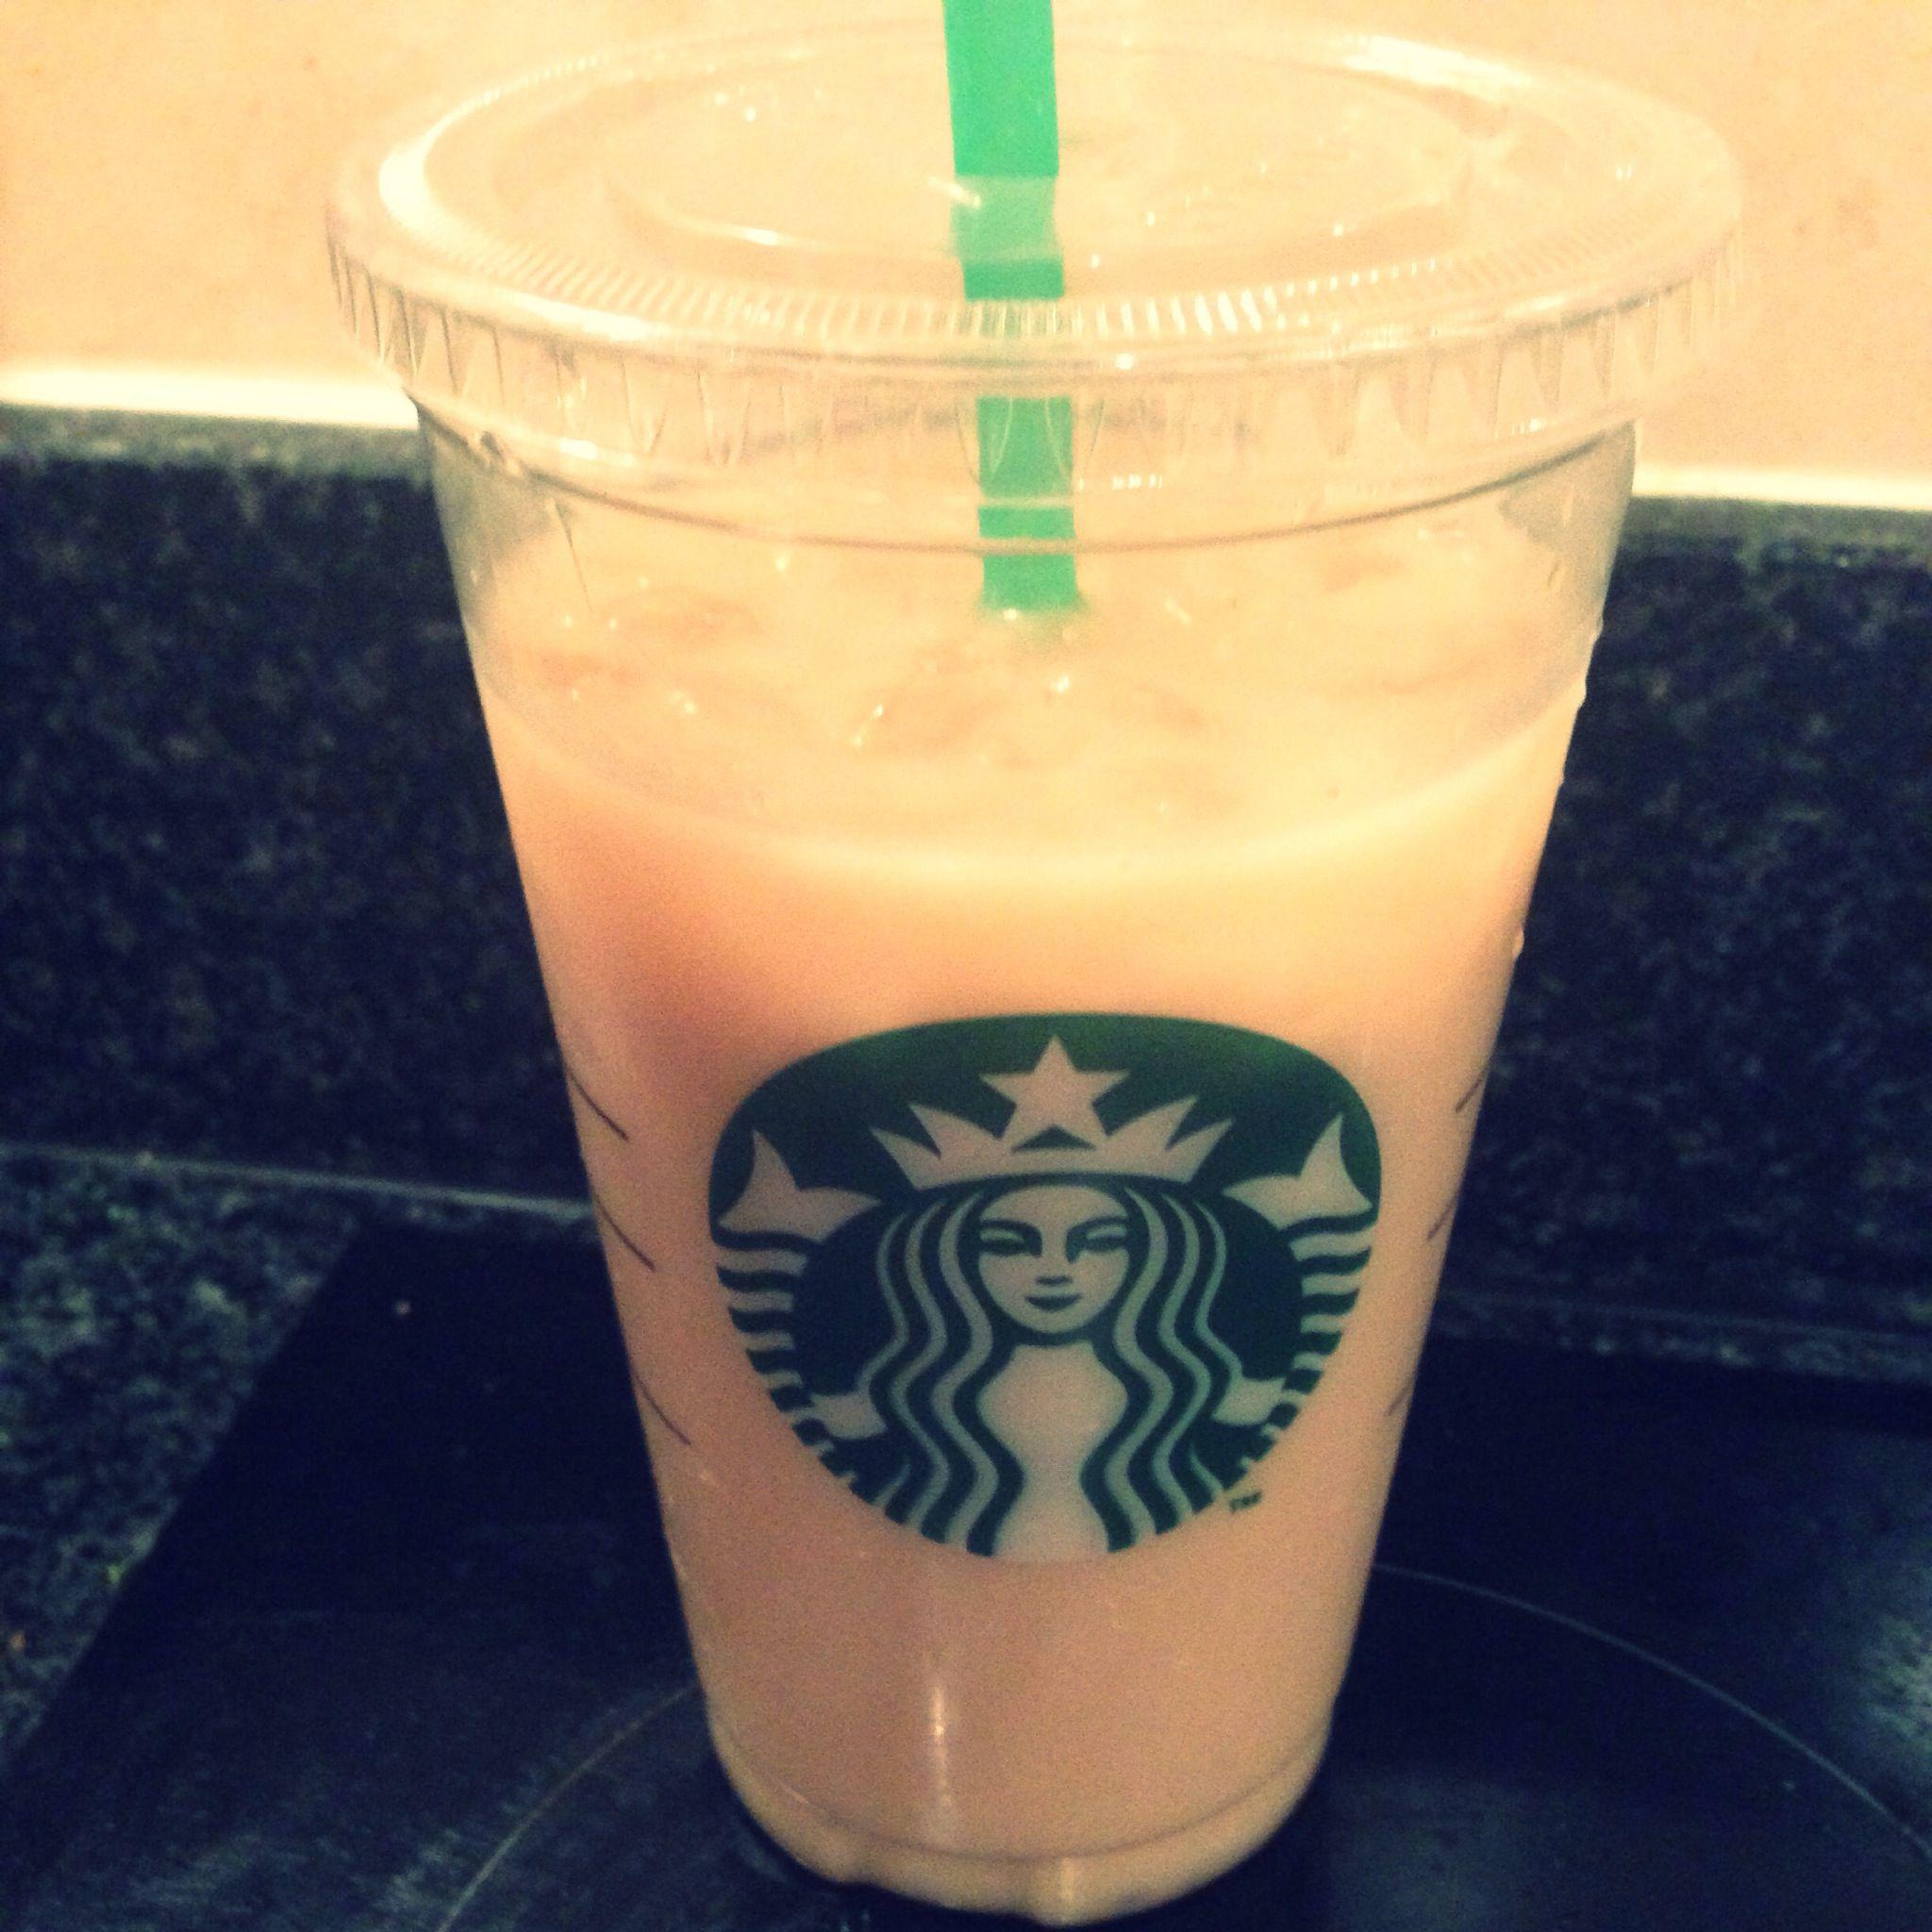 How to make a healthier starbucks iced chai latte recipe